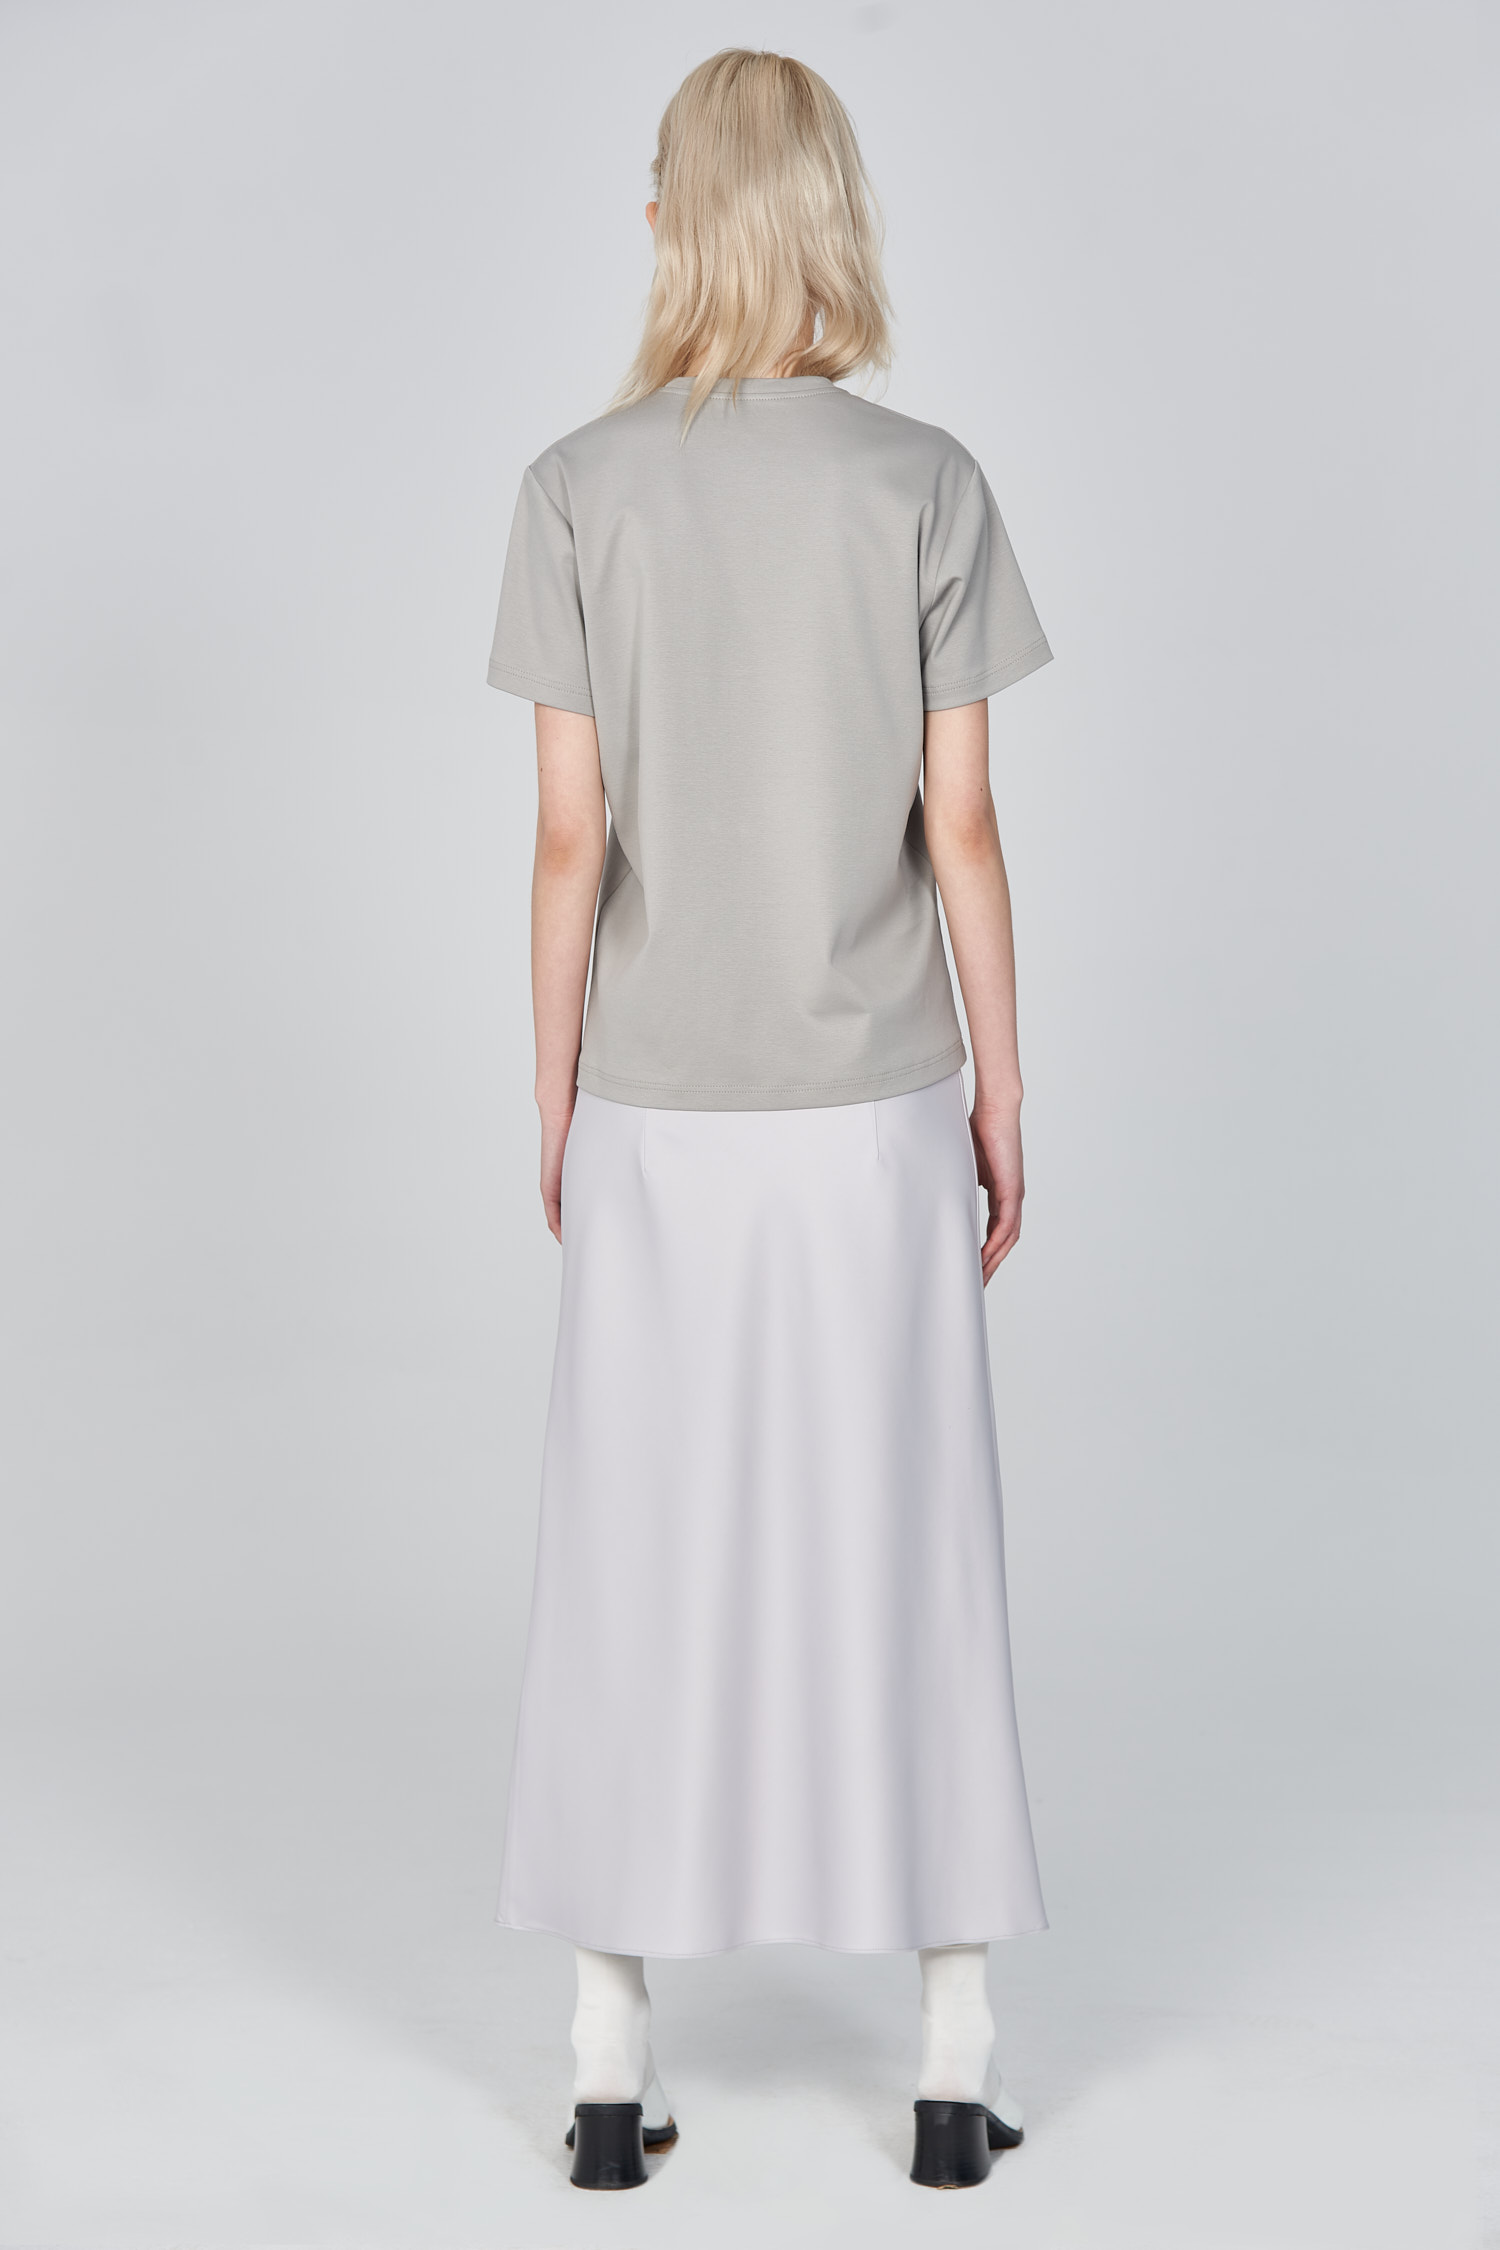 Acephala Ss21 Grey Logo T Shirt Silver Satin Skirt Back